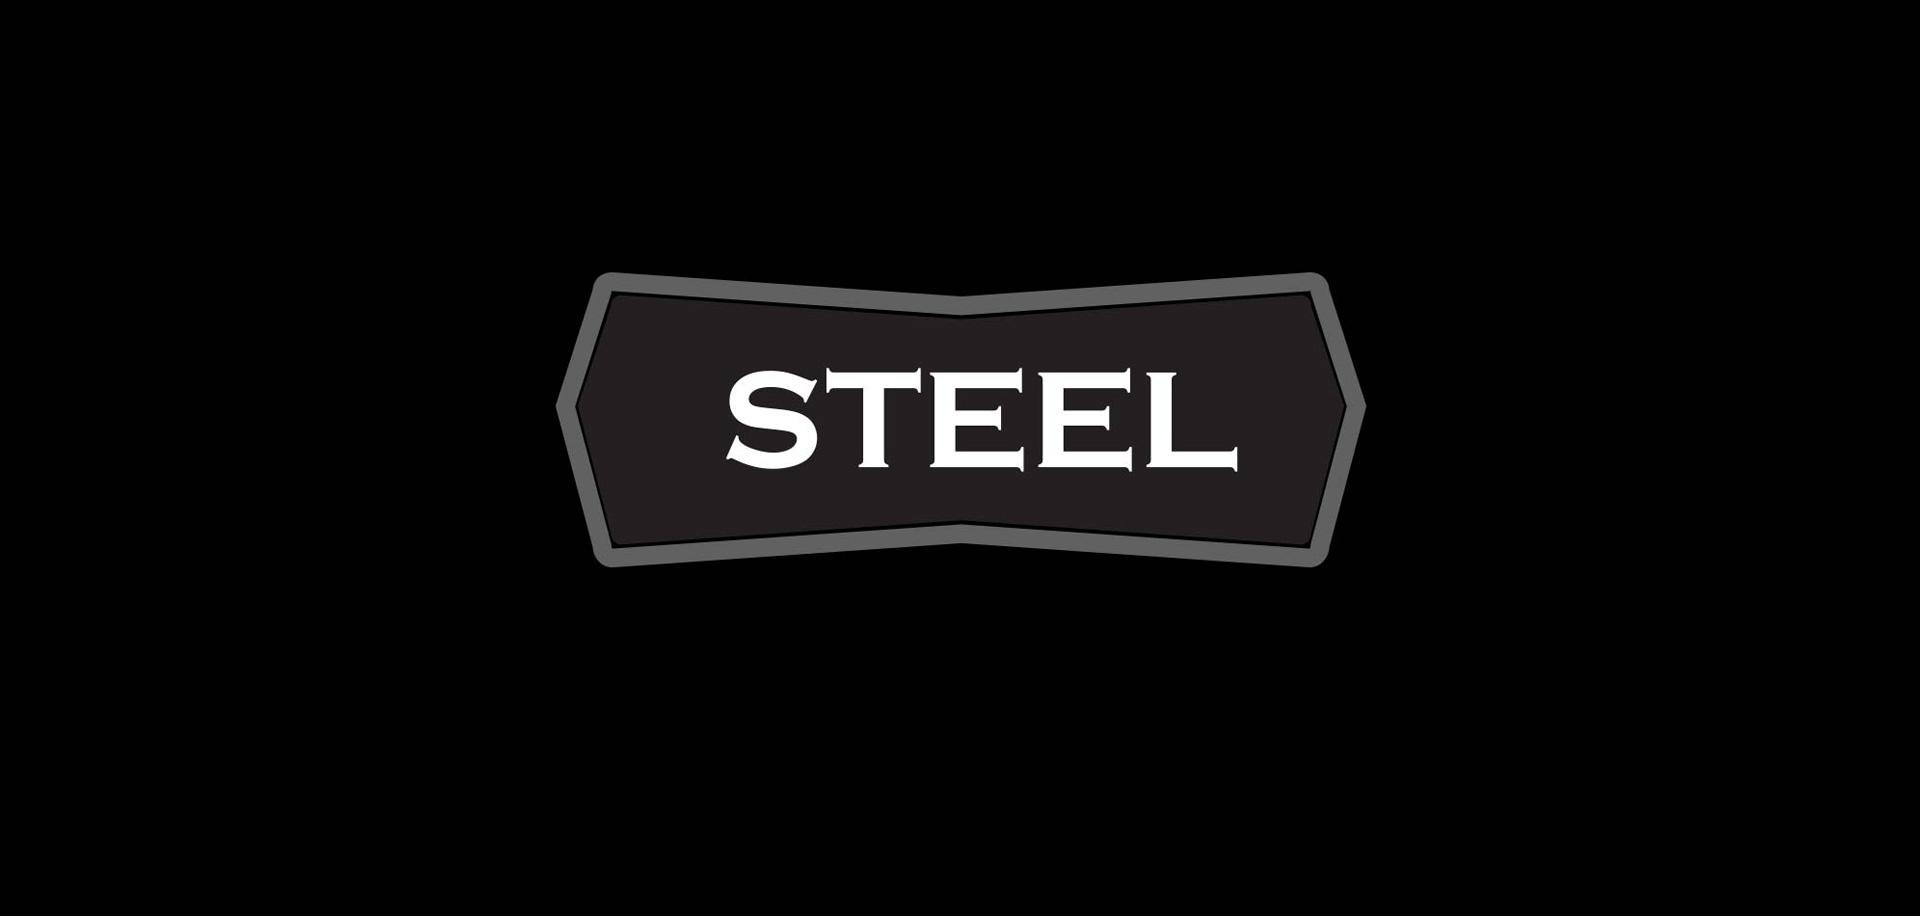 Steel icon